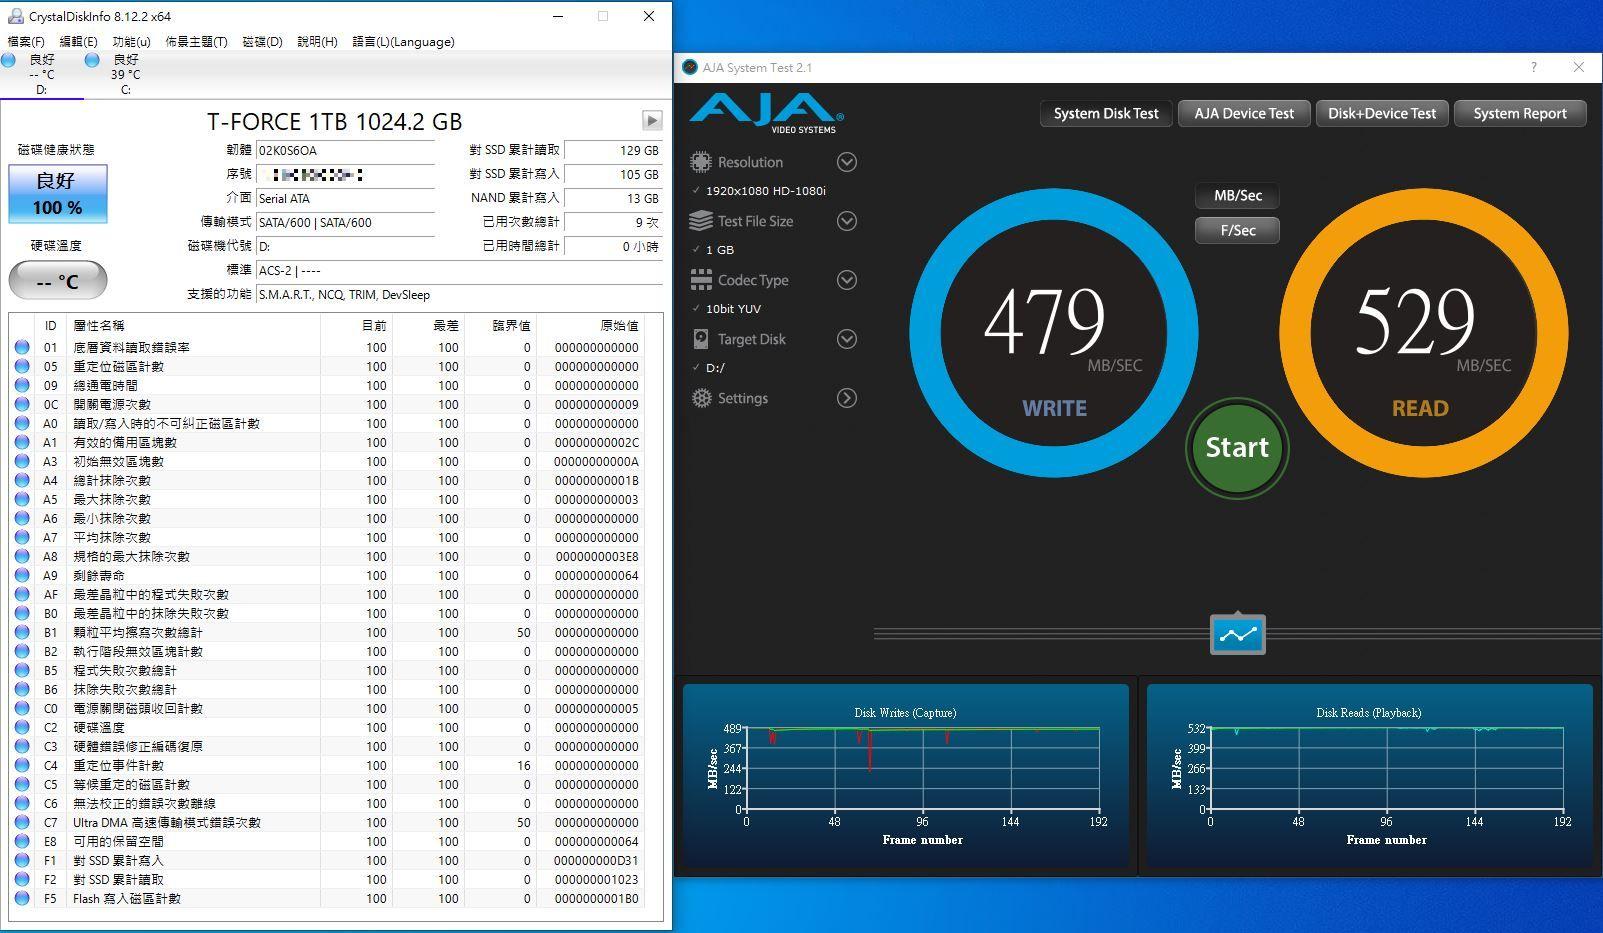 十銓T-FORCE DELTA MAX WHITE RGB SSD固態硬碟-ARGB發光還不夠,白...7013